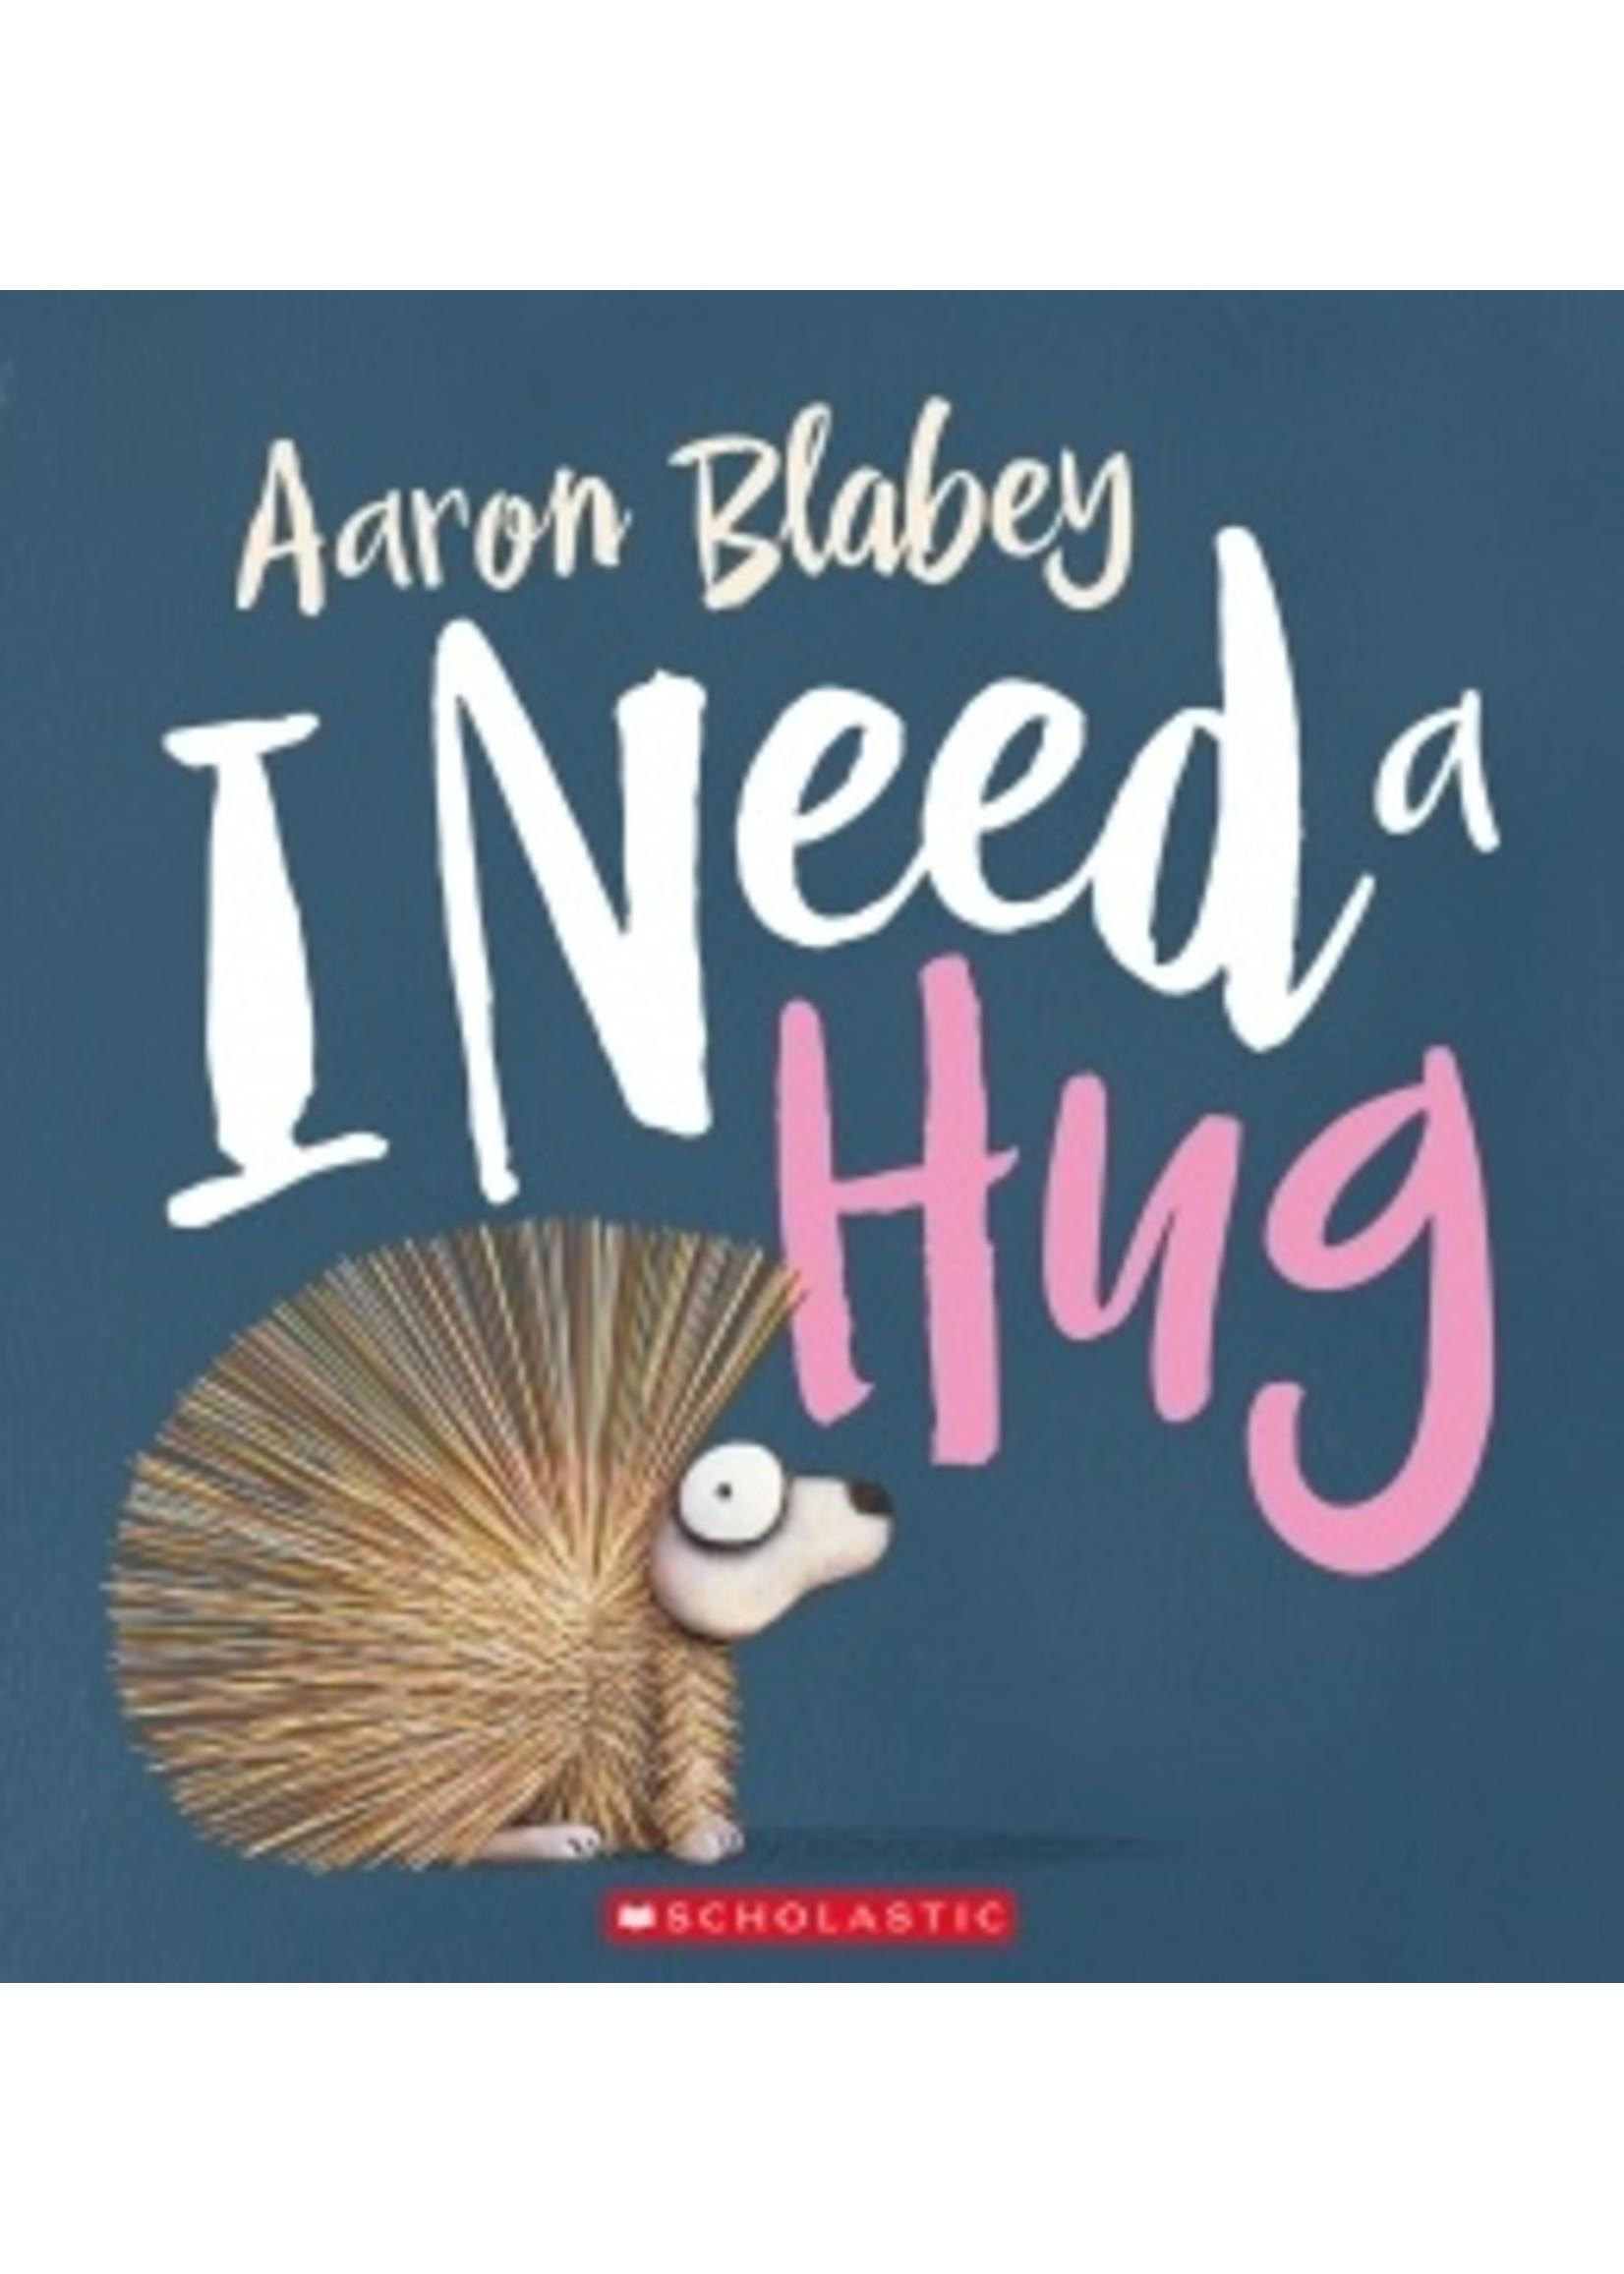 Scholastic I need a hug